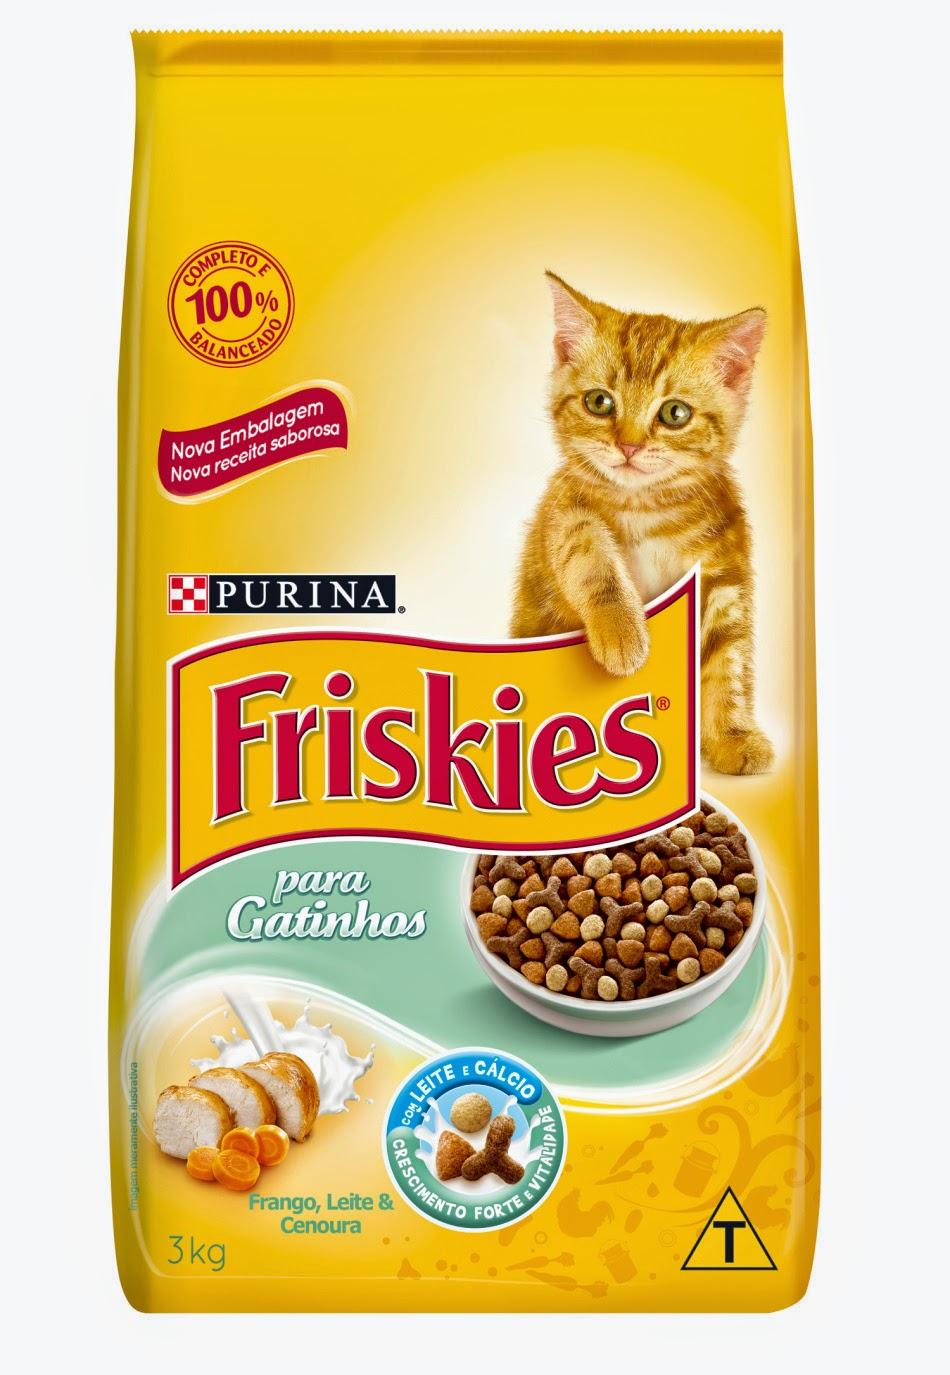 Ração pra gato Friskies